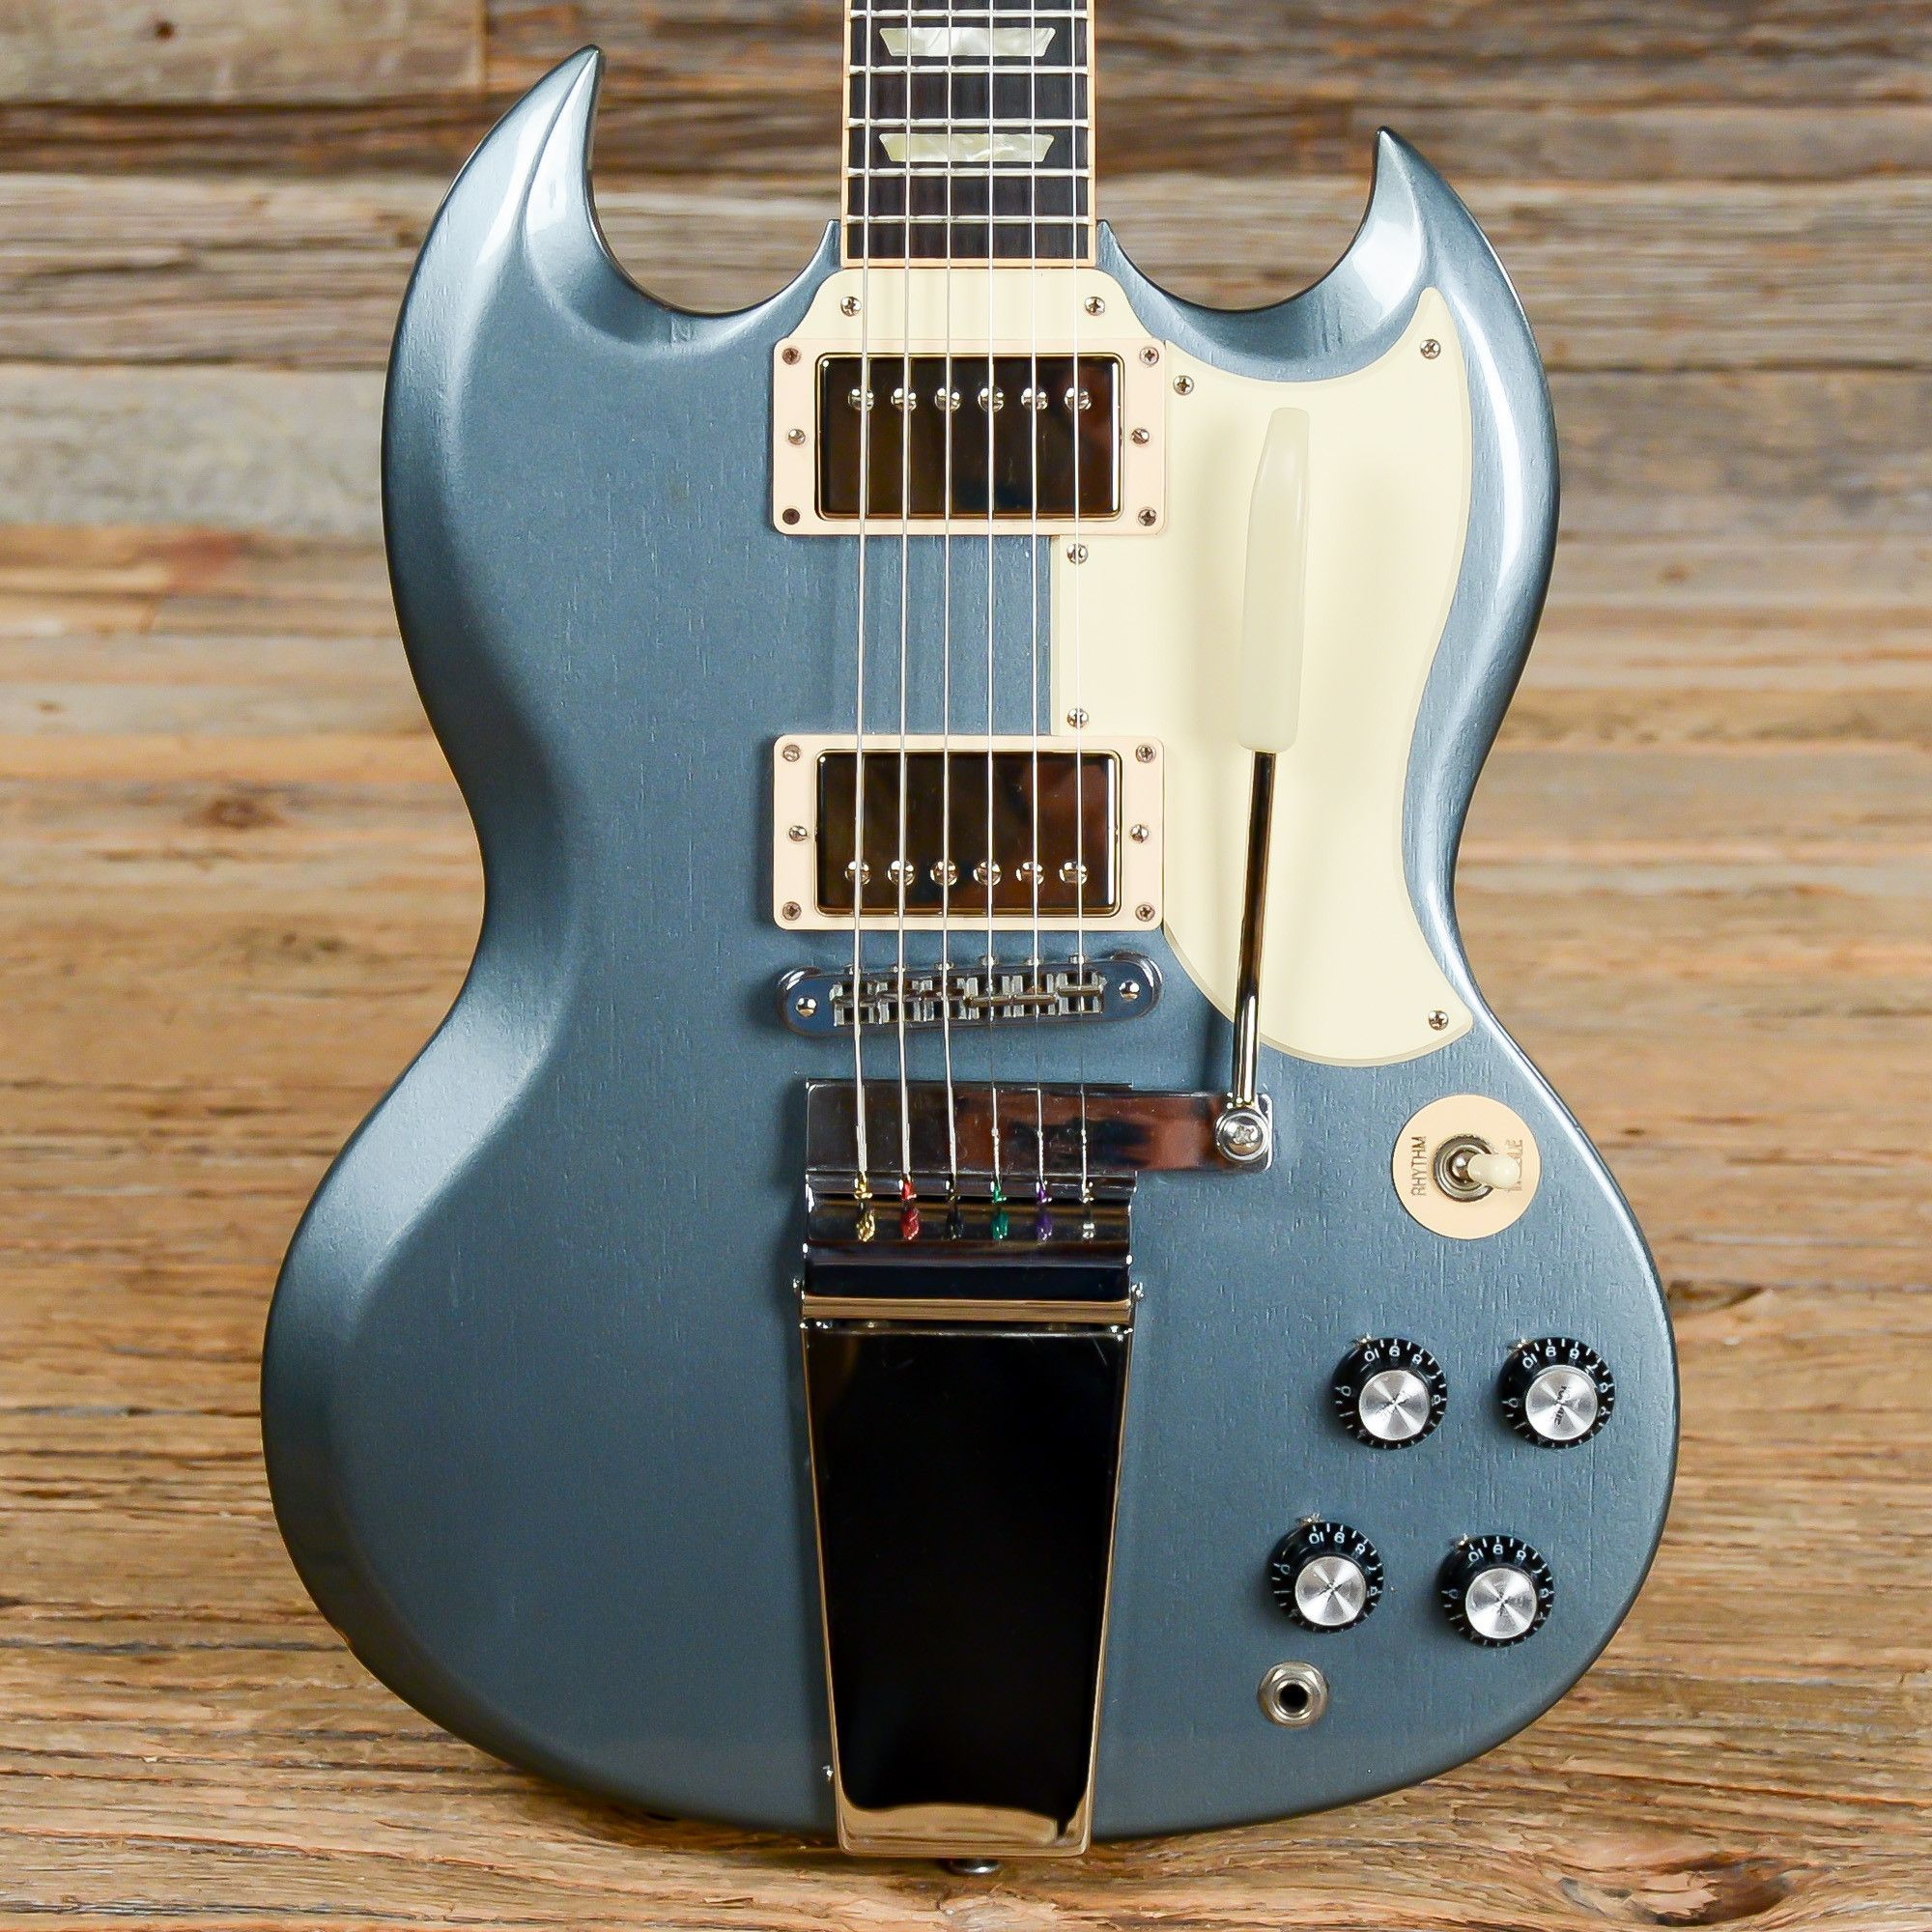 gibson jeff tweedy sg pelham blue 2012 s675 guitars. Black Bedroom Furniture Sets. Home Design Ideas